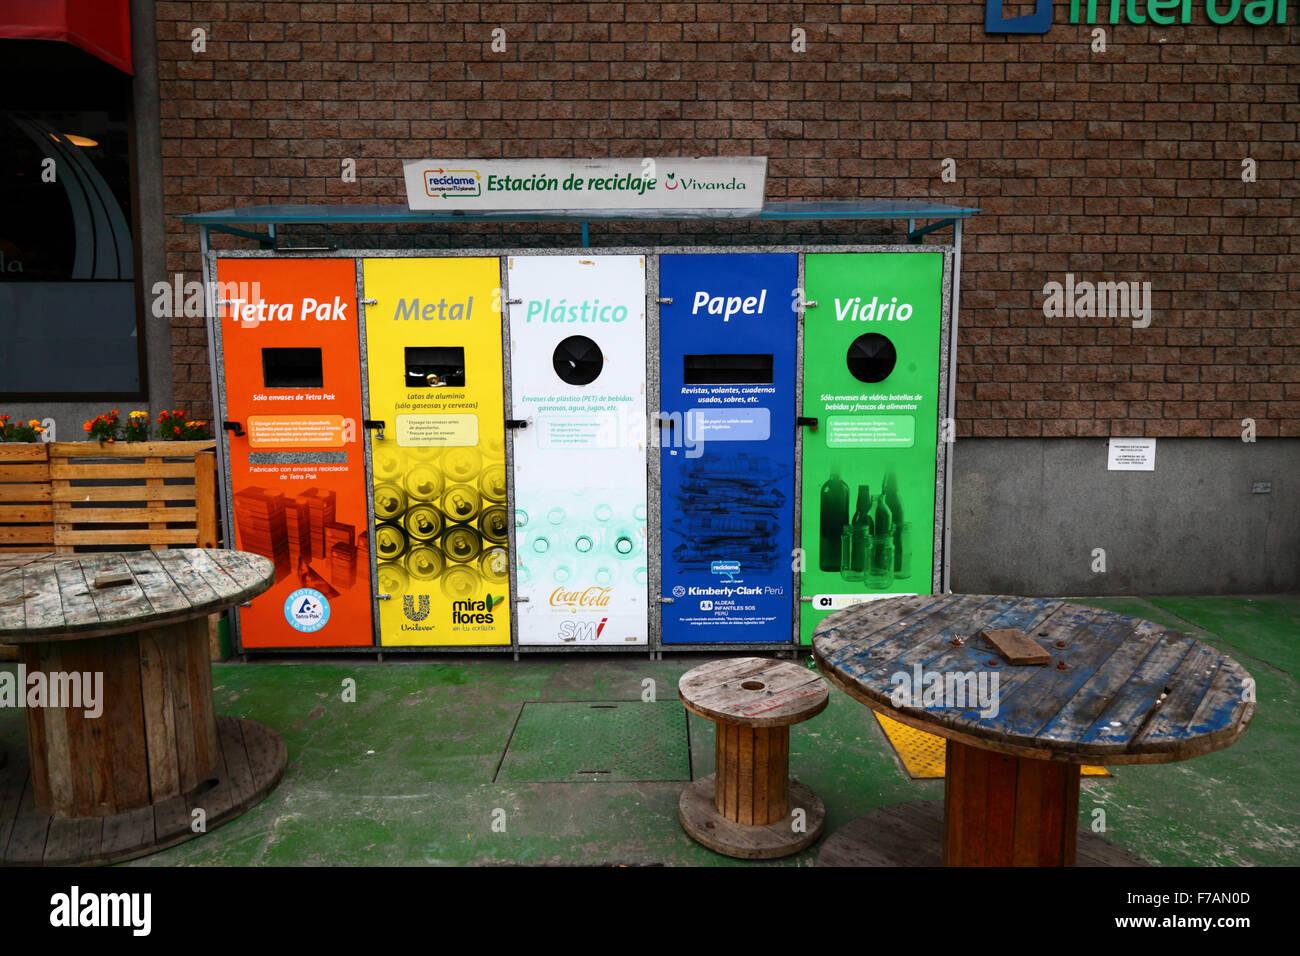 Recycling bins for domestic waste outside Vivanda supermarket, Miraflores, Lima, Peru Stock Photo